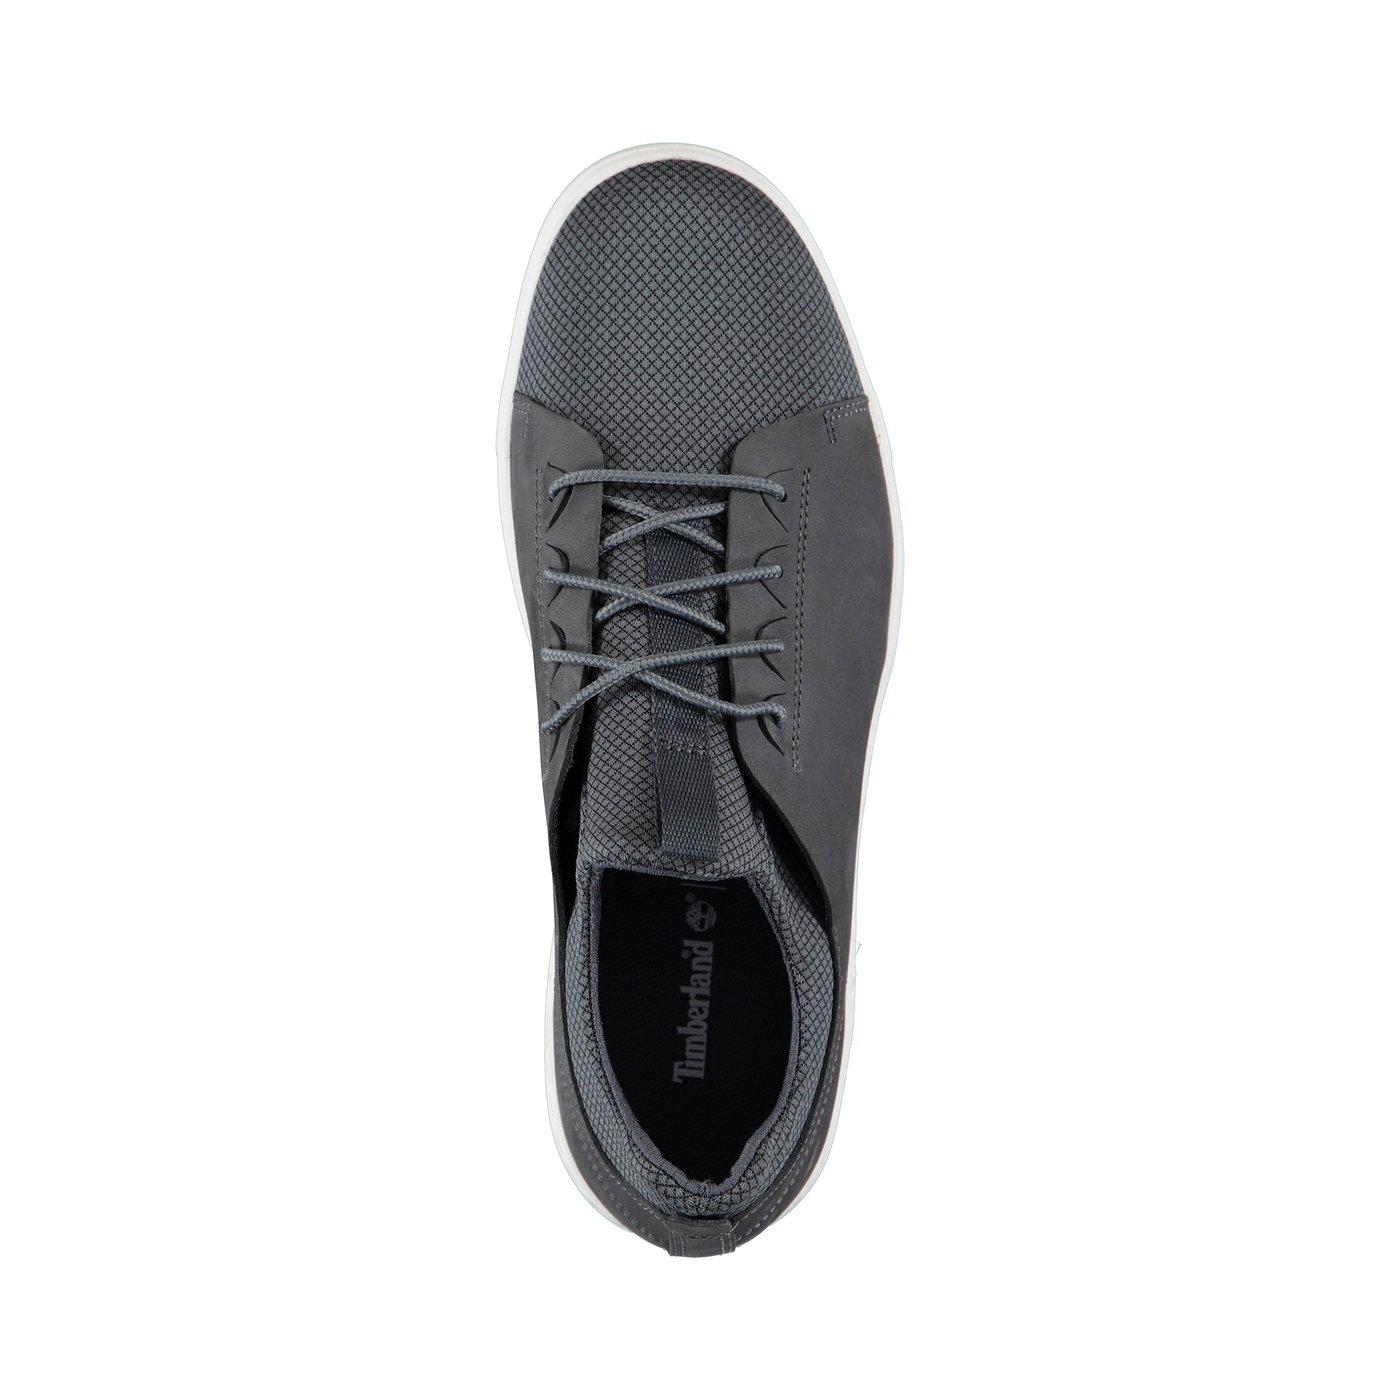 Timberland Amherst Erkek Gri Spor Ayakkabı